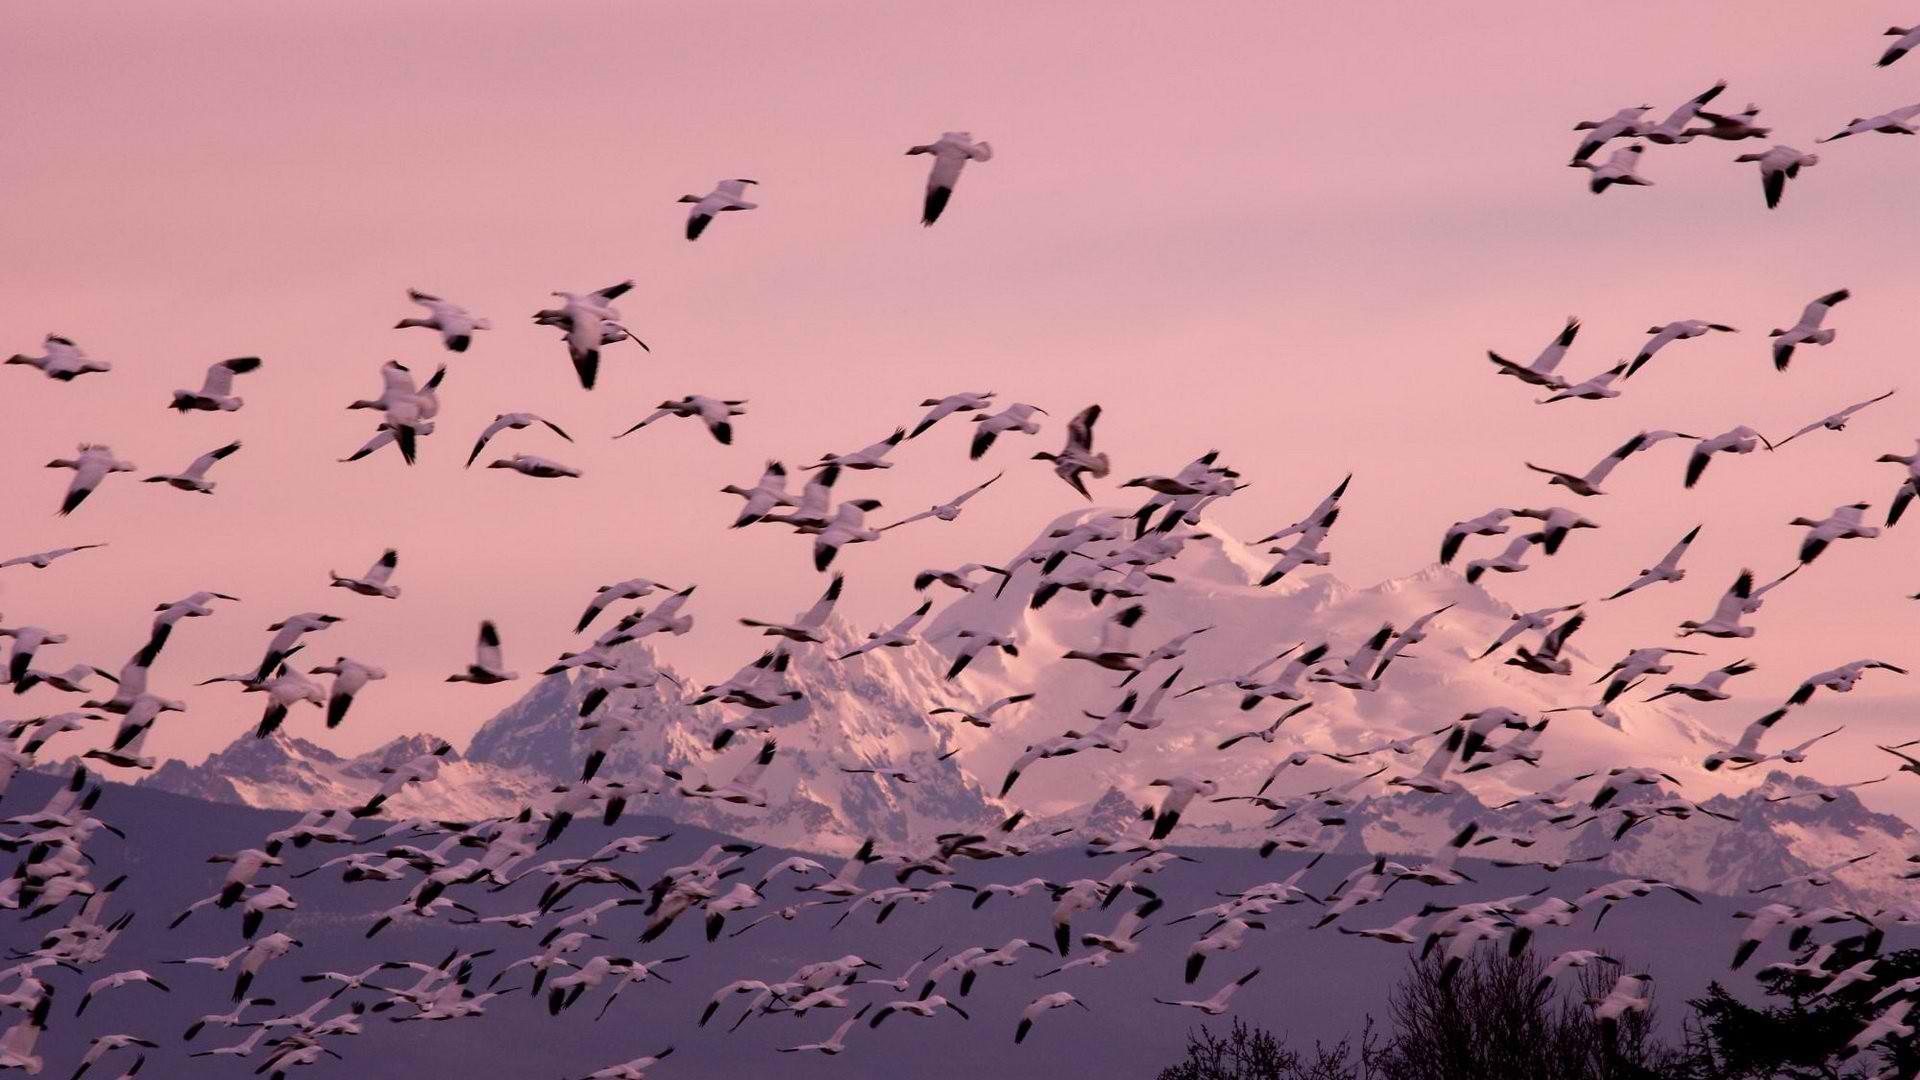 Flock Of Birds Sky Bokeh 41 Wallpaper 1920x1080 219299